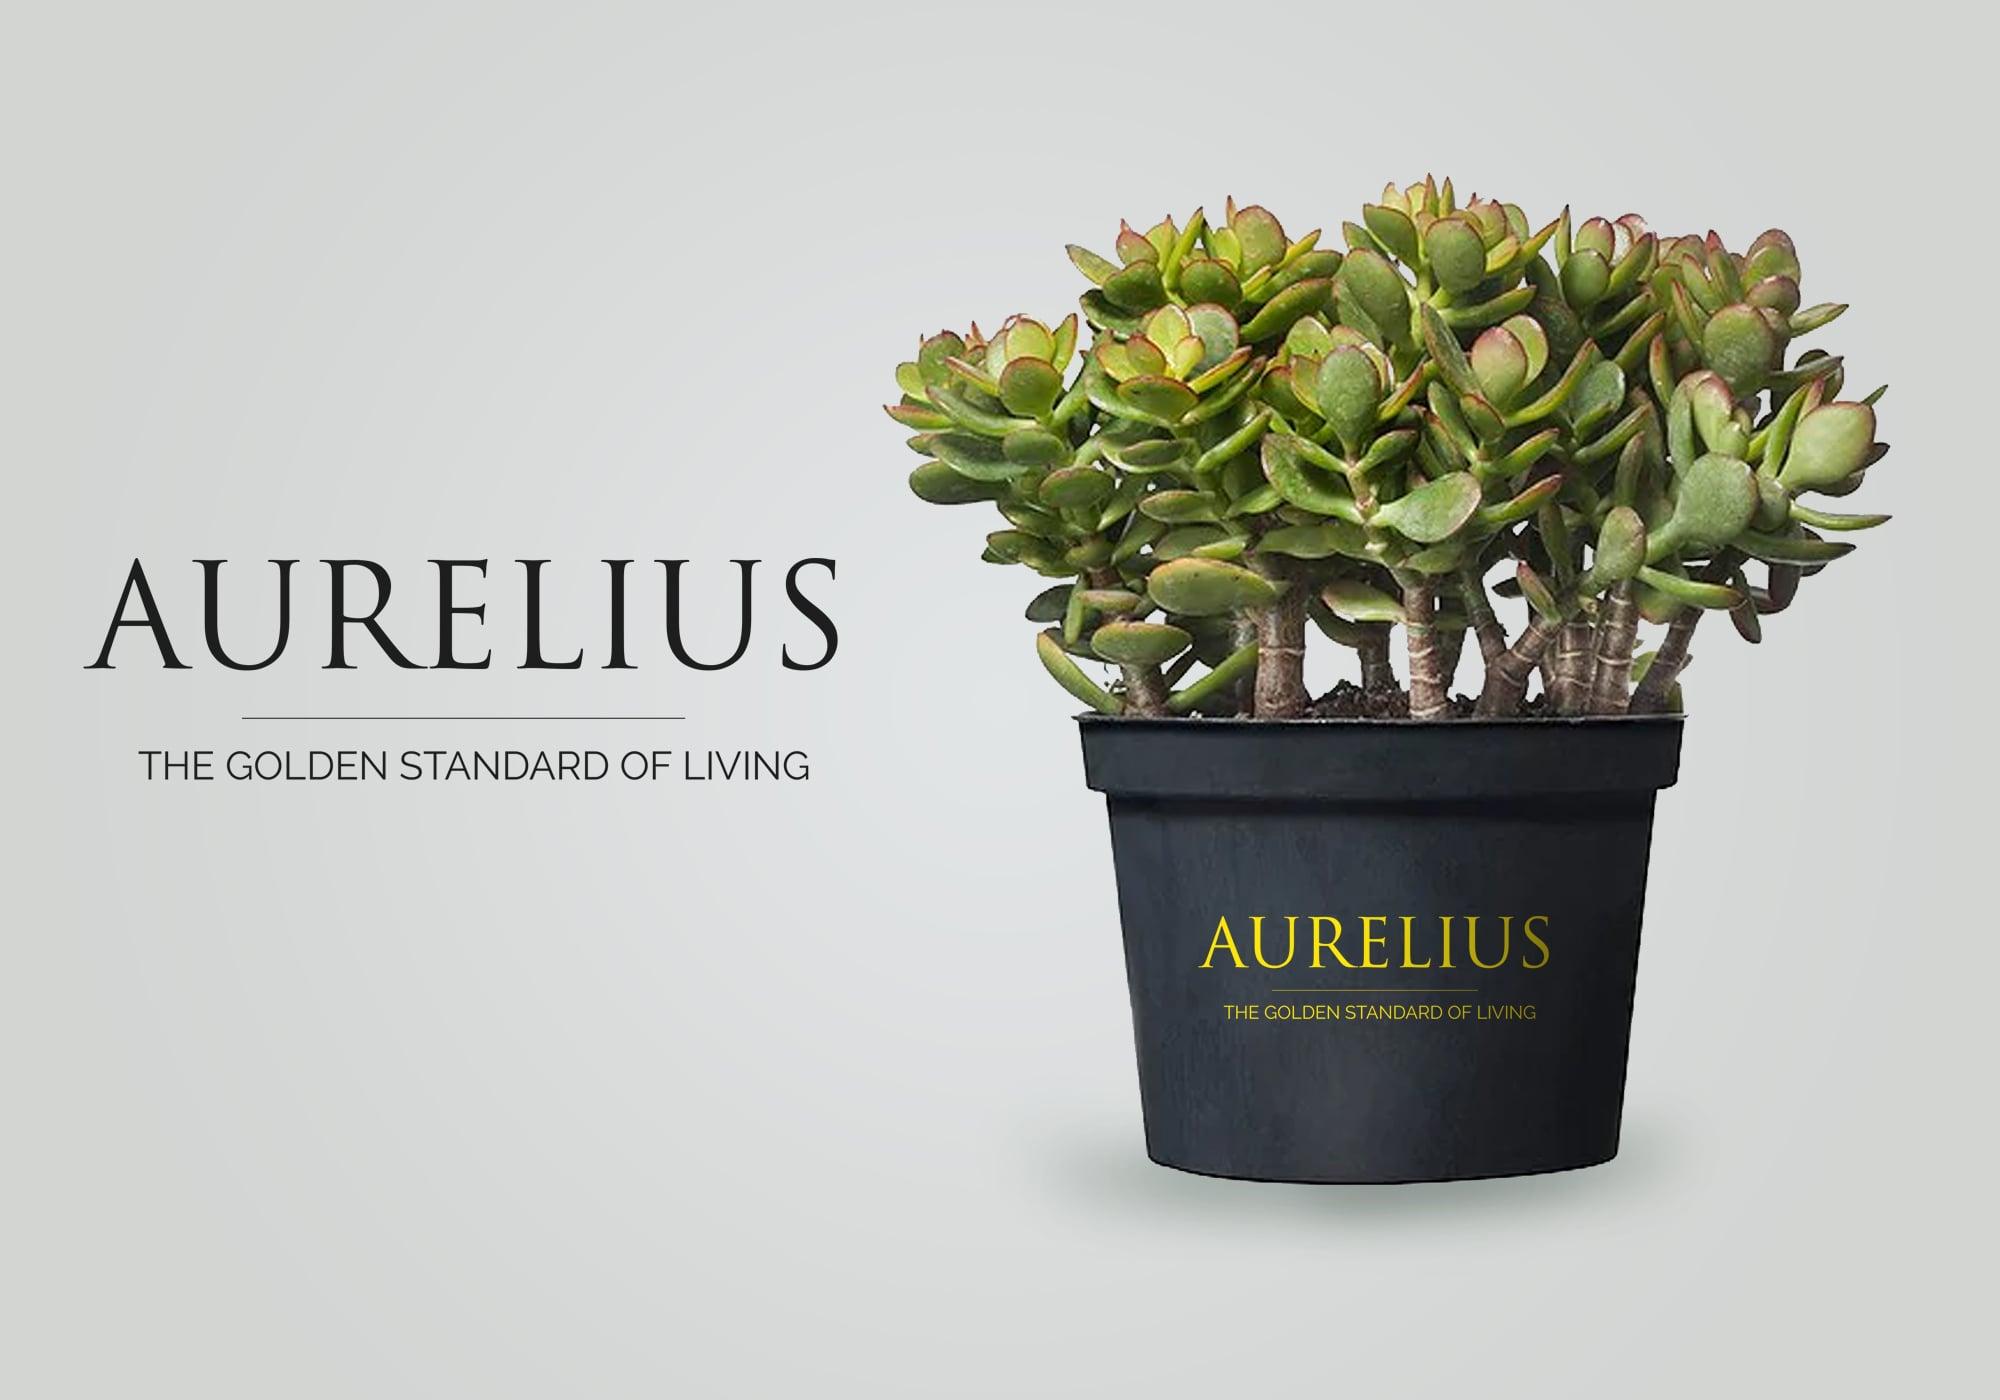 Creative Advertising and Marketing Agency aurelius-real-estate-branding-design-literature-1